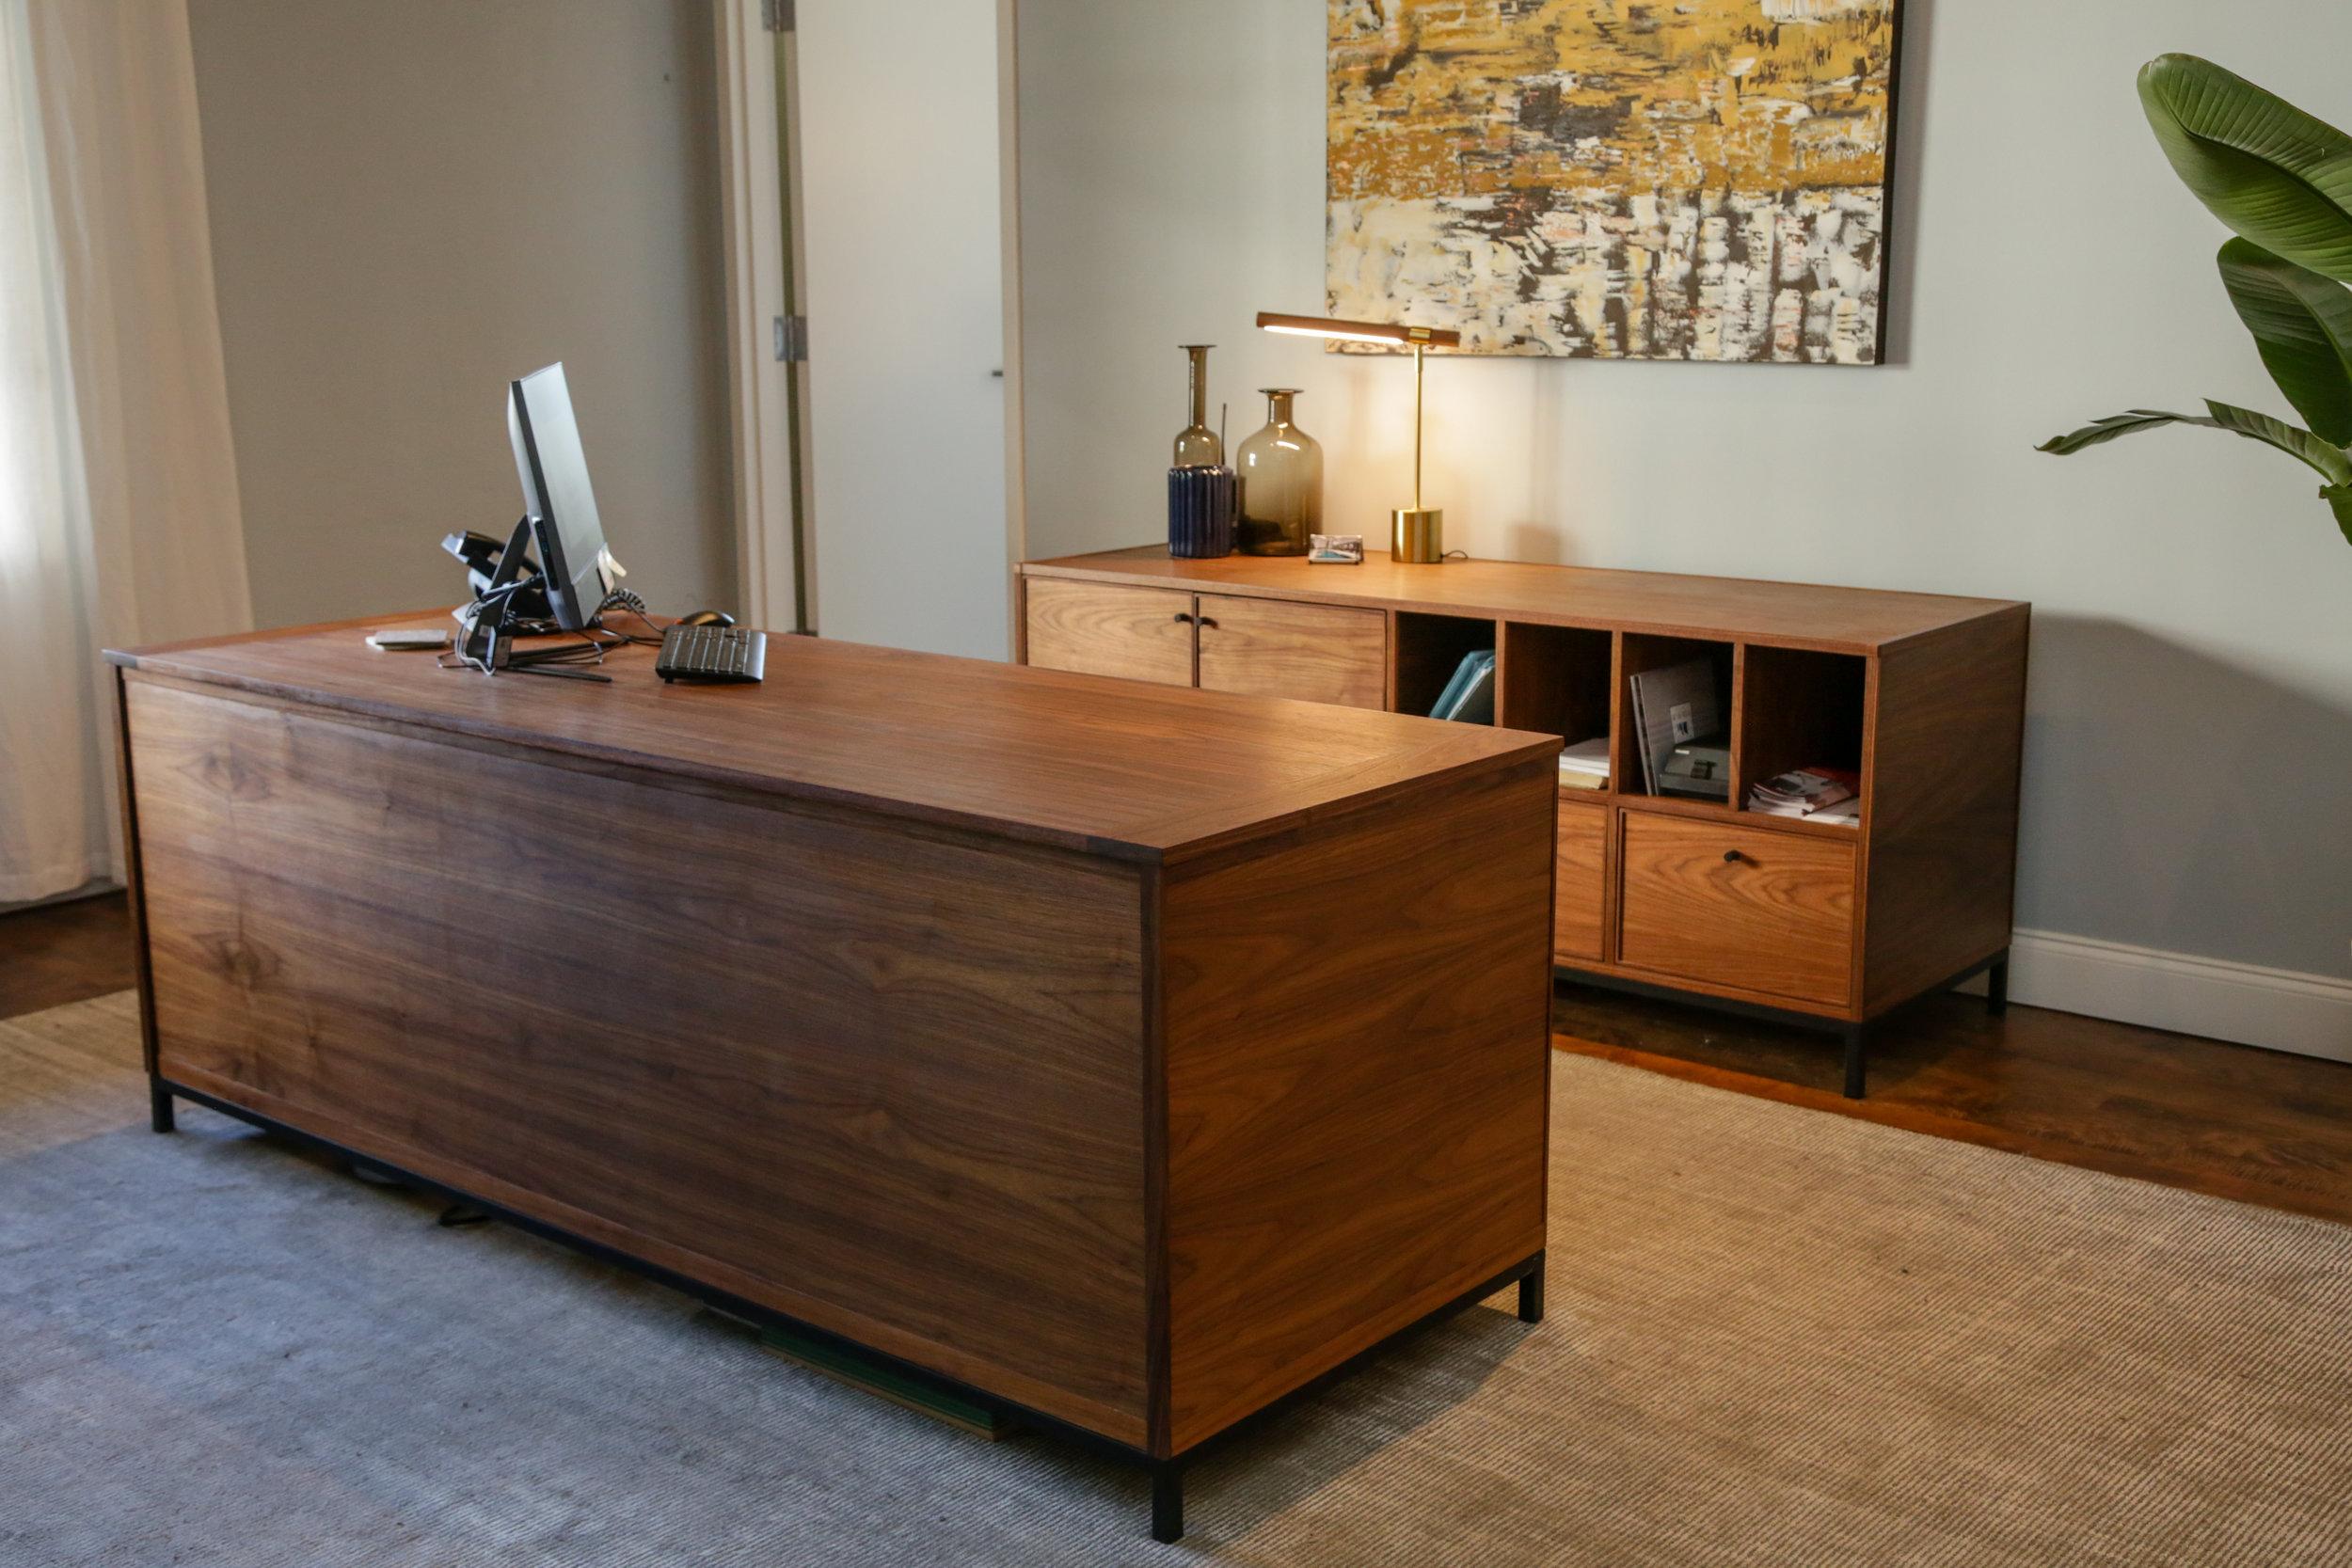 Goodwood Nola Design And Fabrication